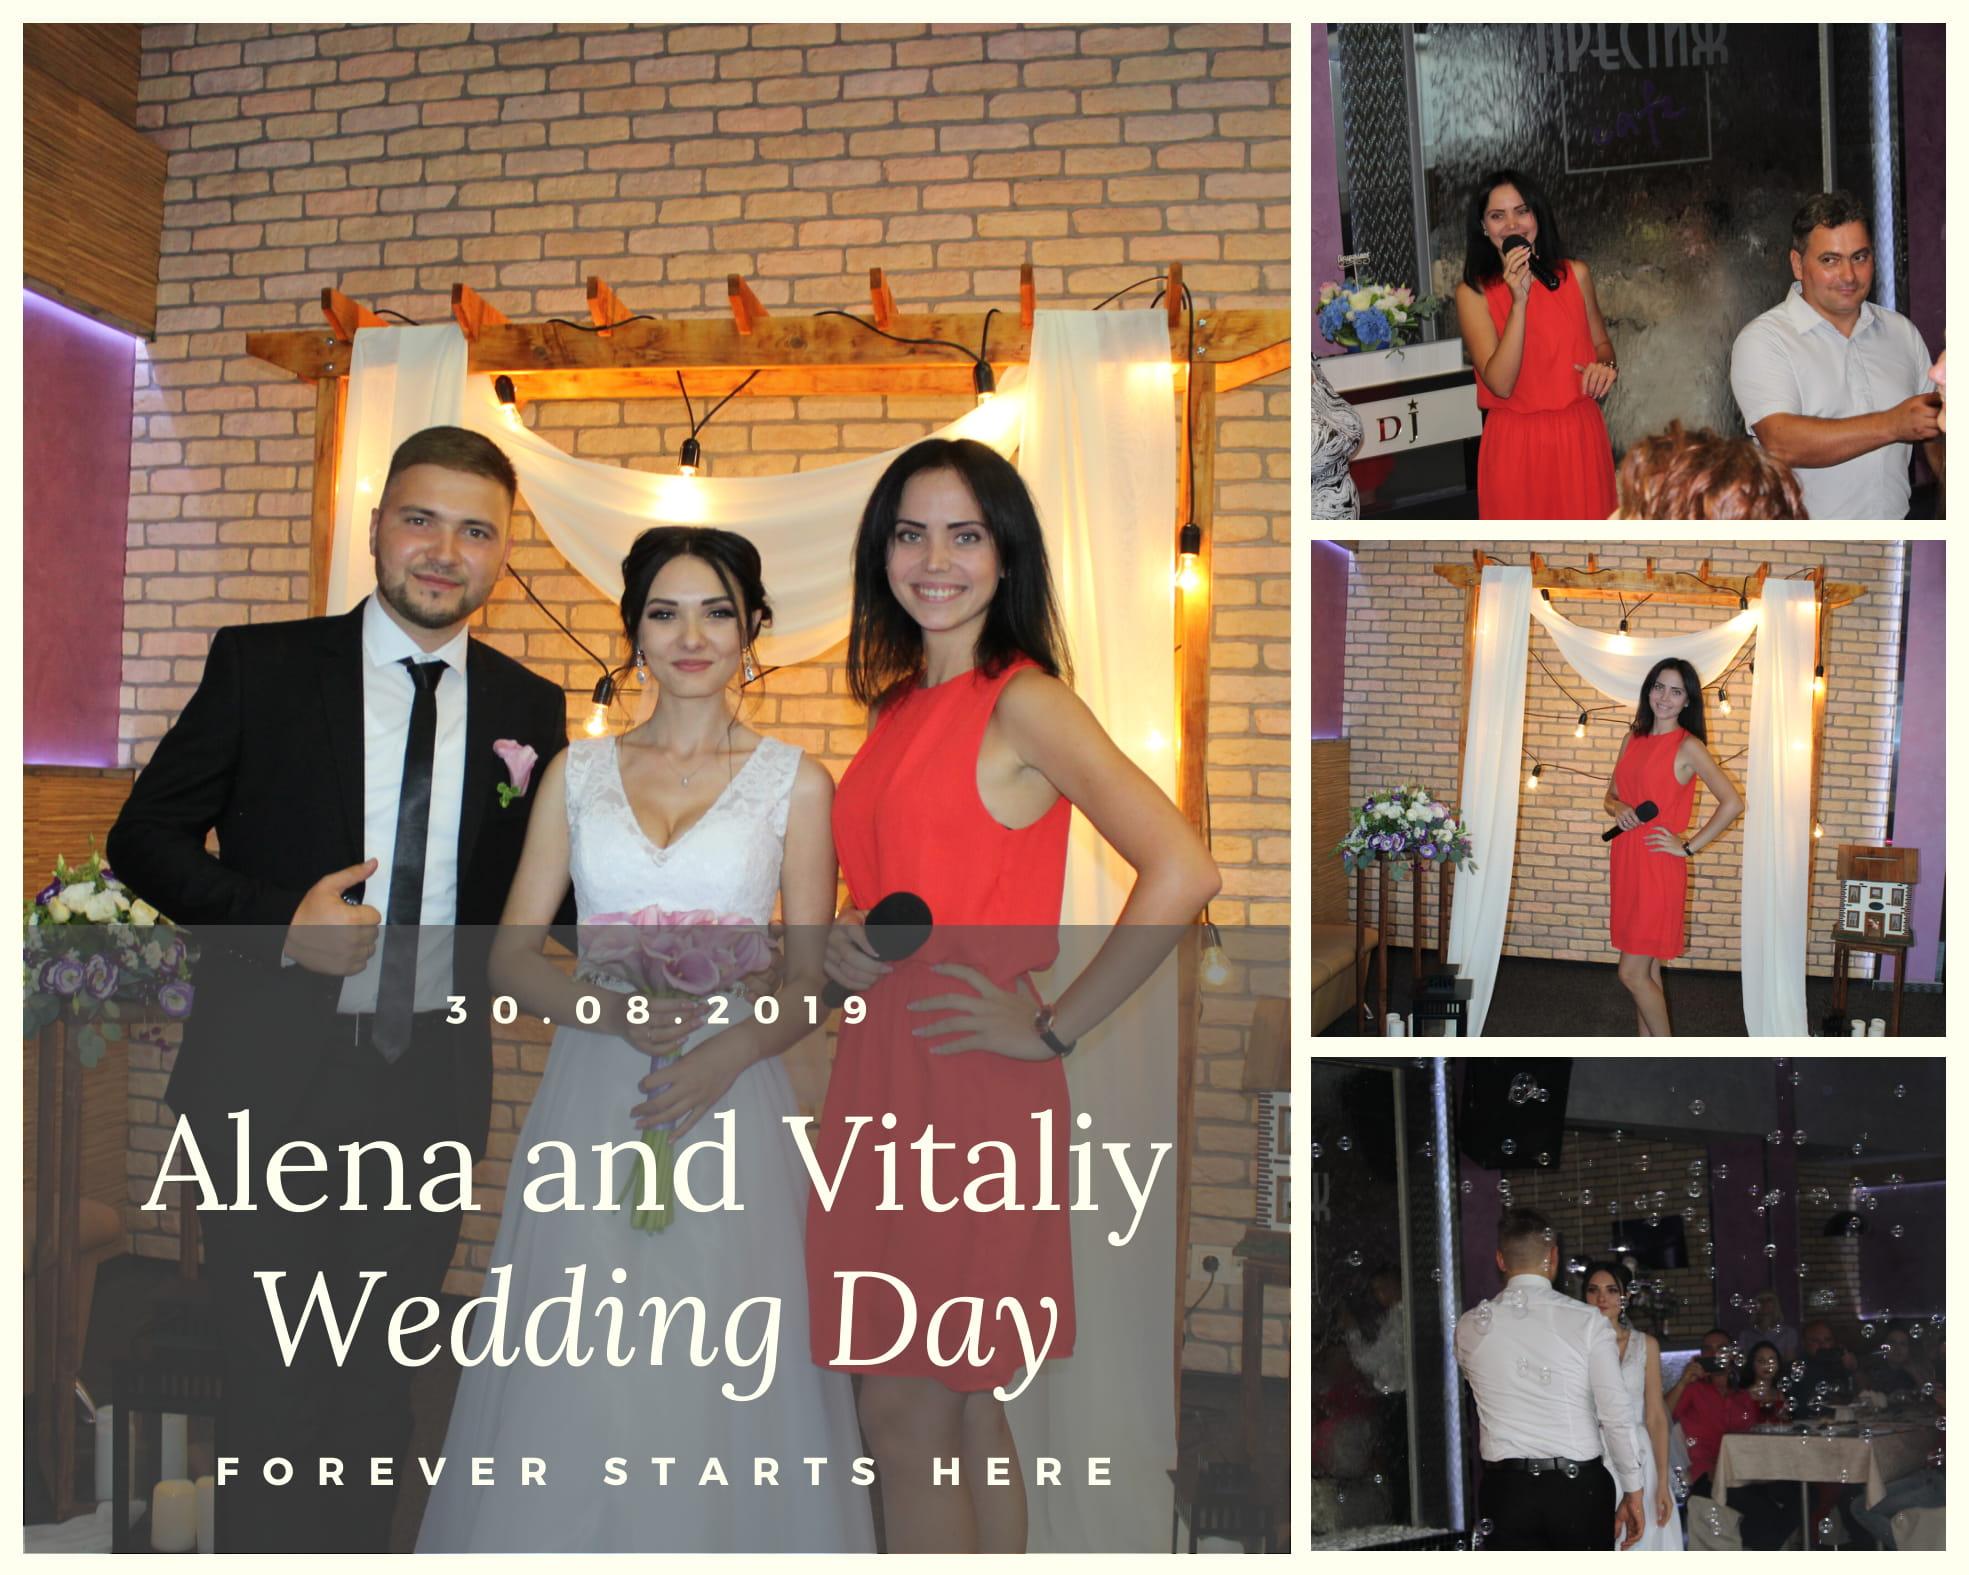 Alena and Vitaliy Wedding Day-1